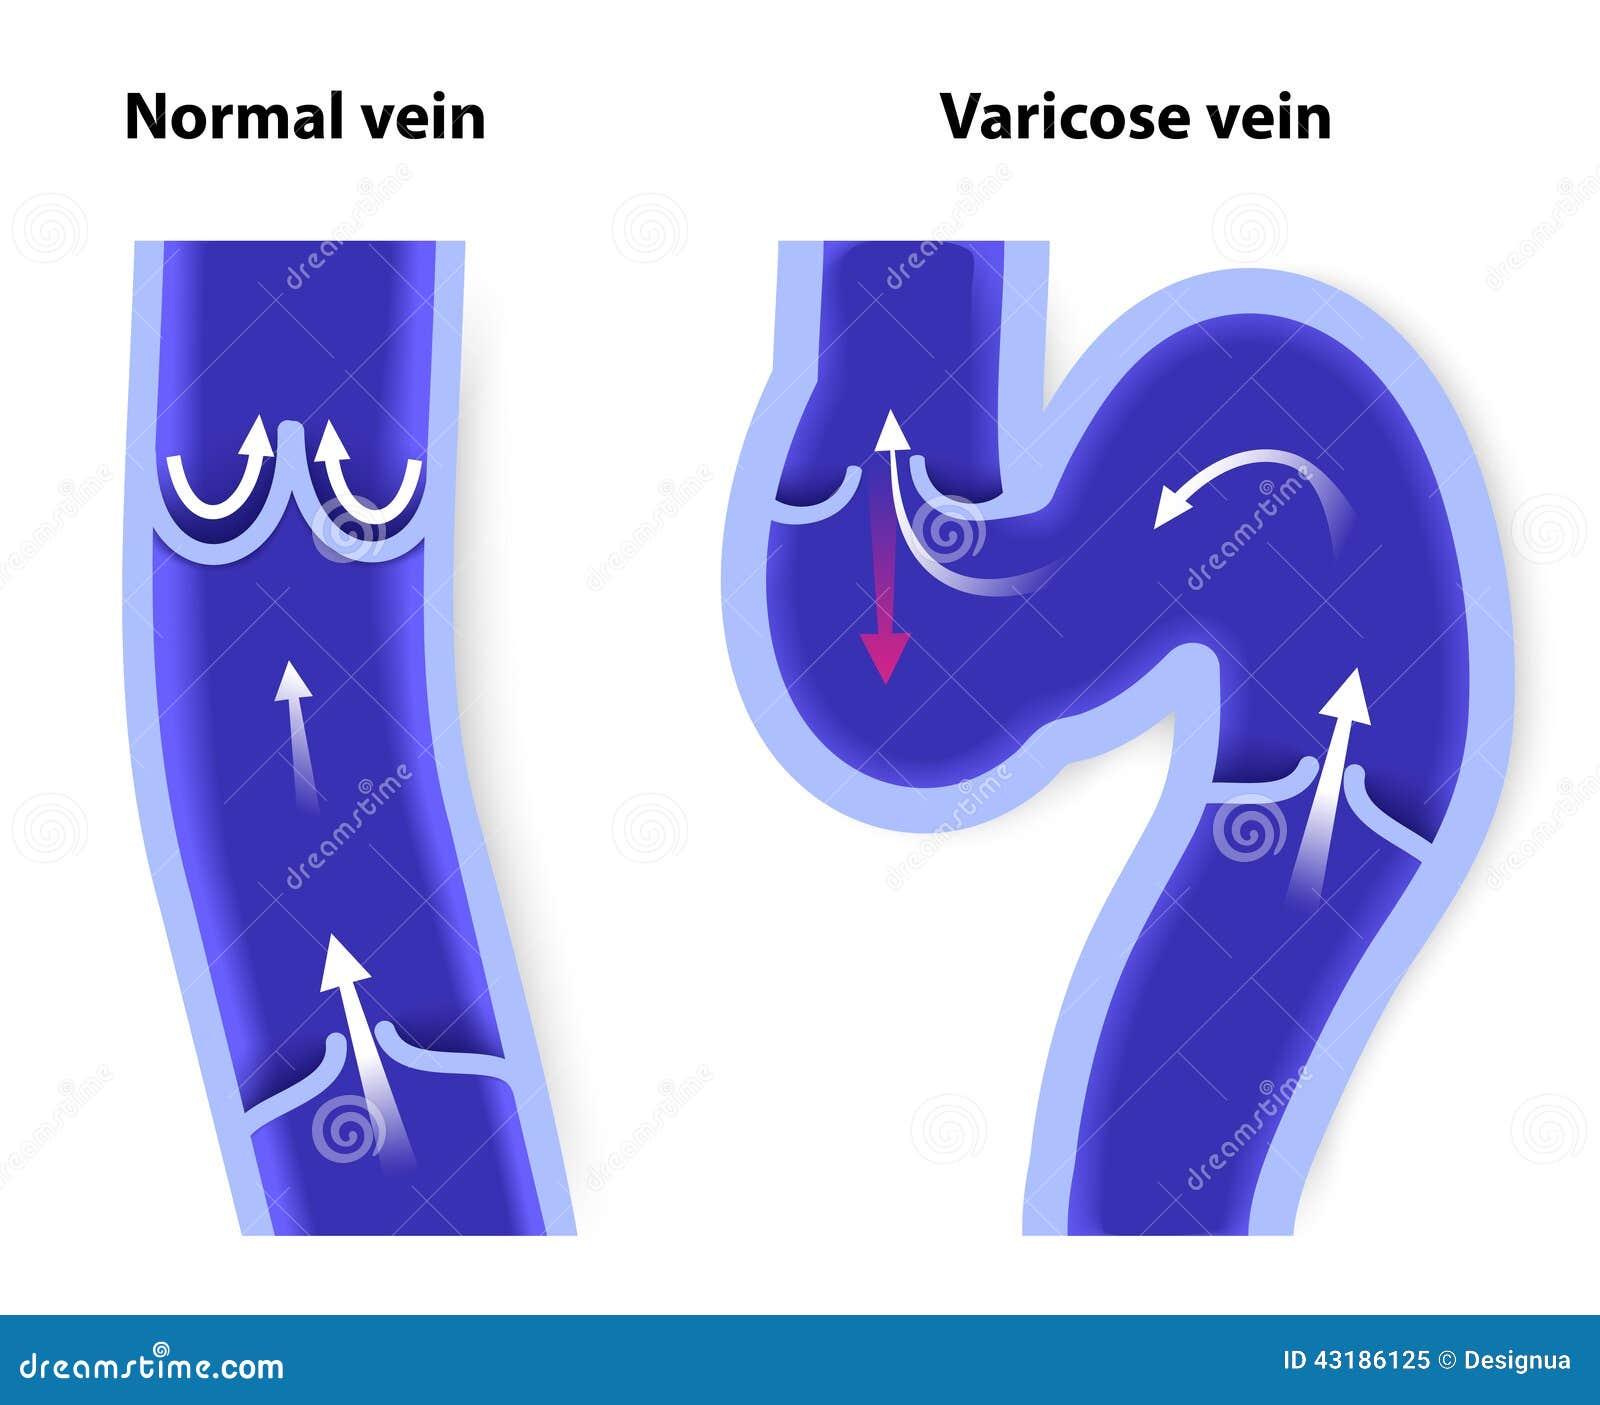 Normal Vein And Varicose Vein Stock Vector Illustration Of Cross